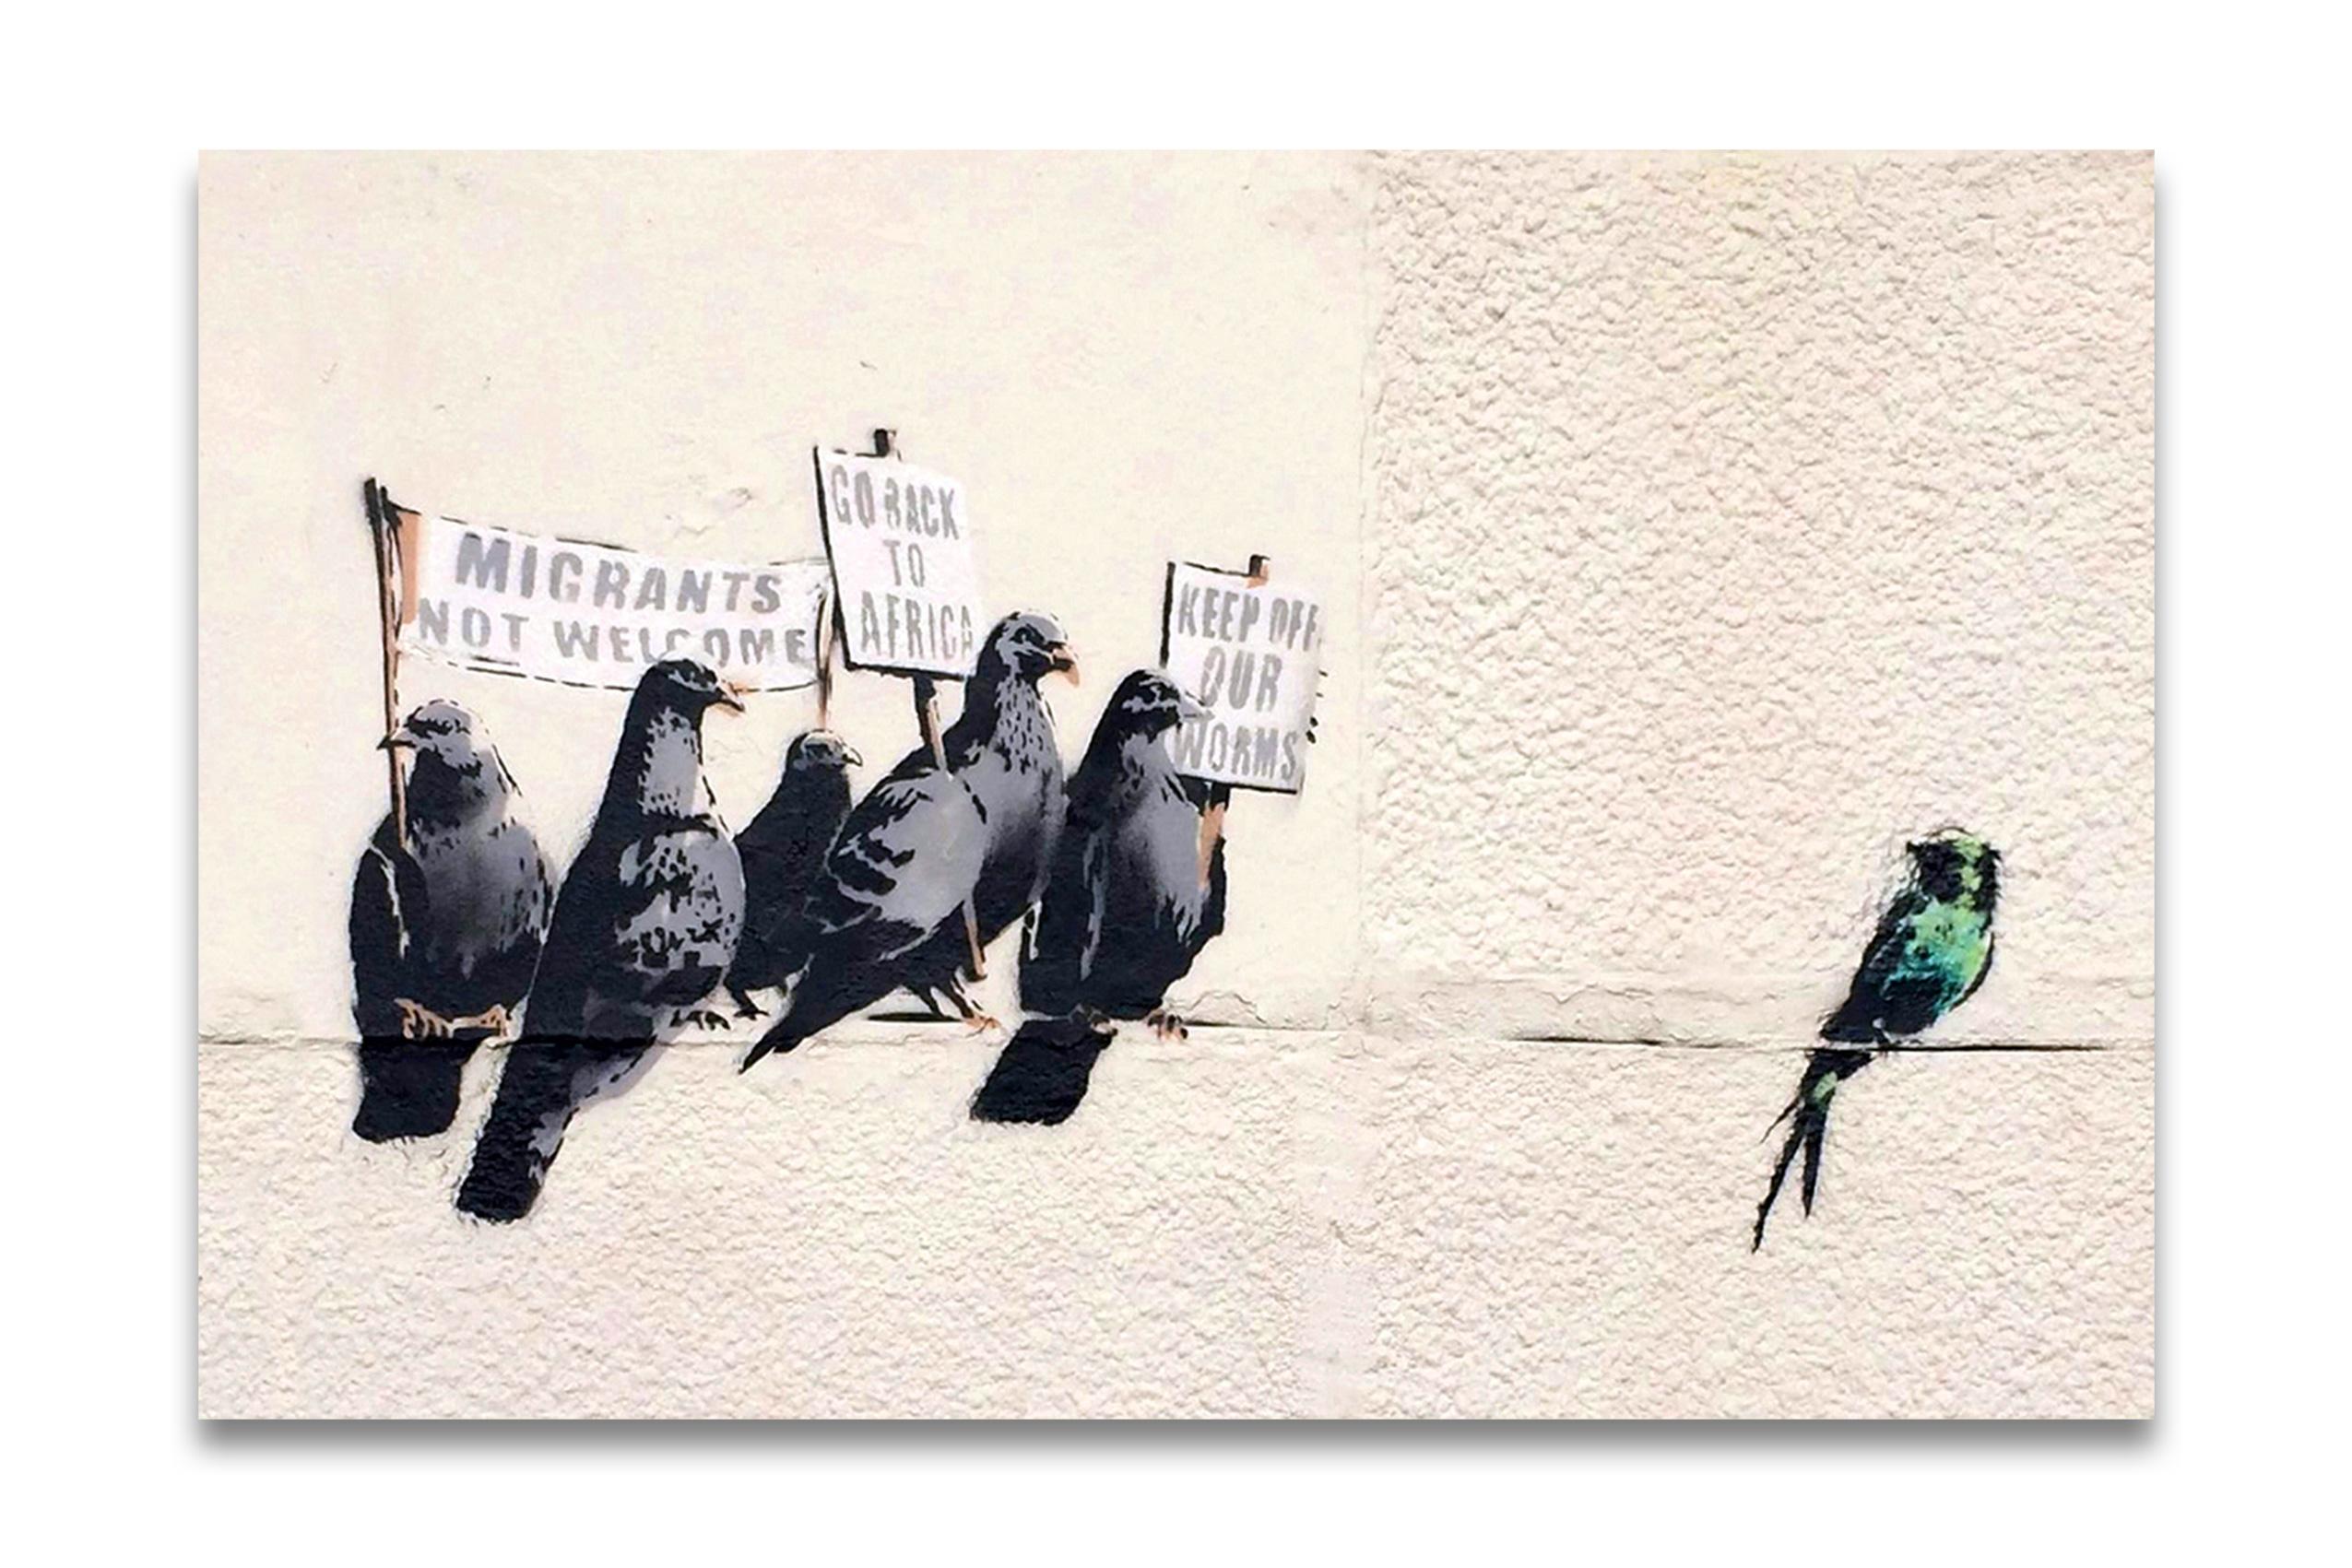 Kunstdruck Leinwand kunstdruck auf leinwand banksy immigration birds 90x60cm